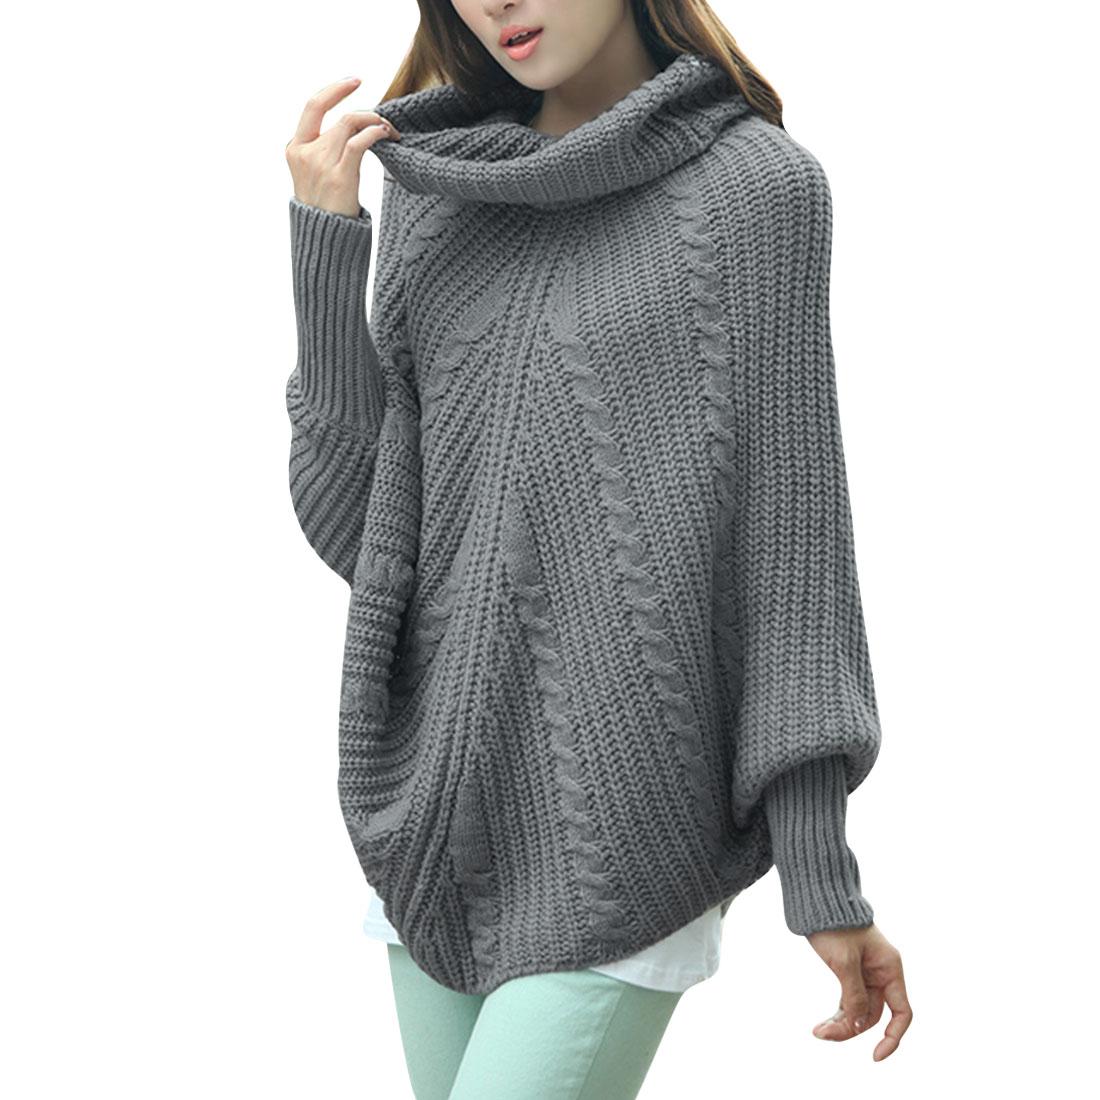 Women Batwing Sleeved Turtle Neck Dark Gray Knit Tunic Sweater S